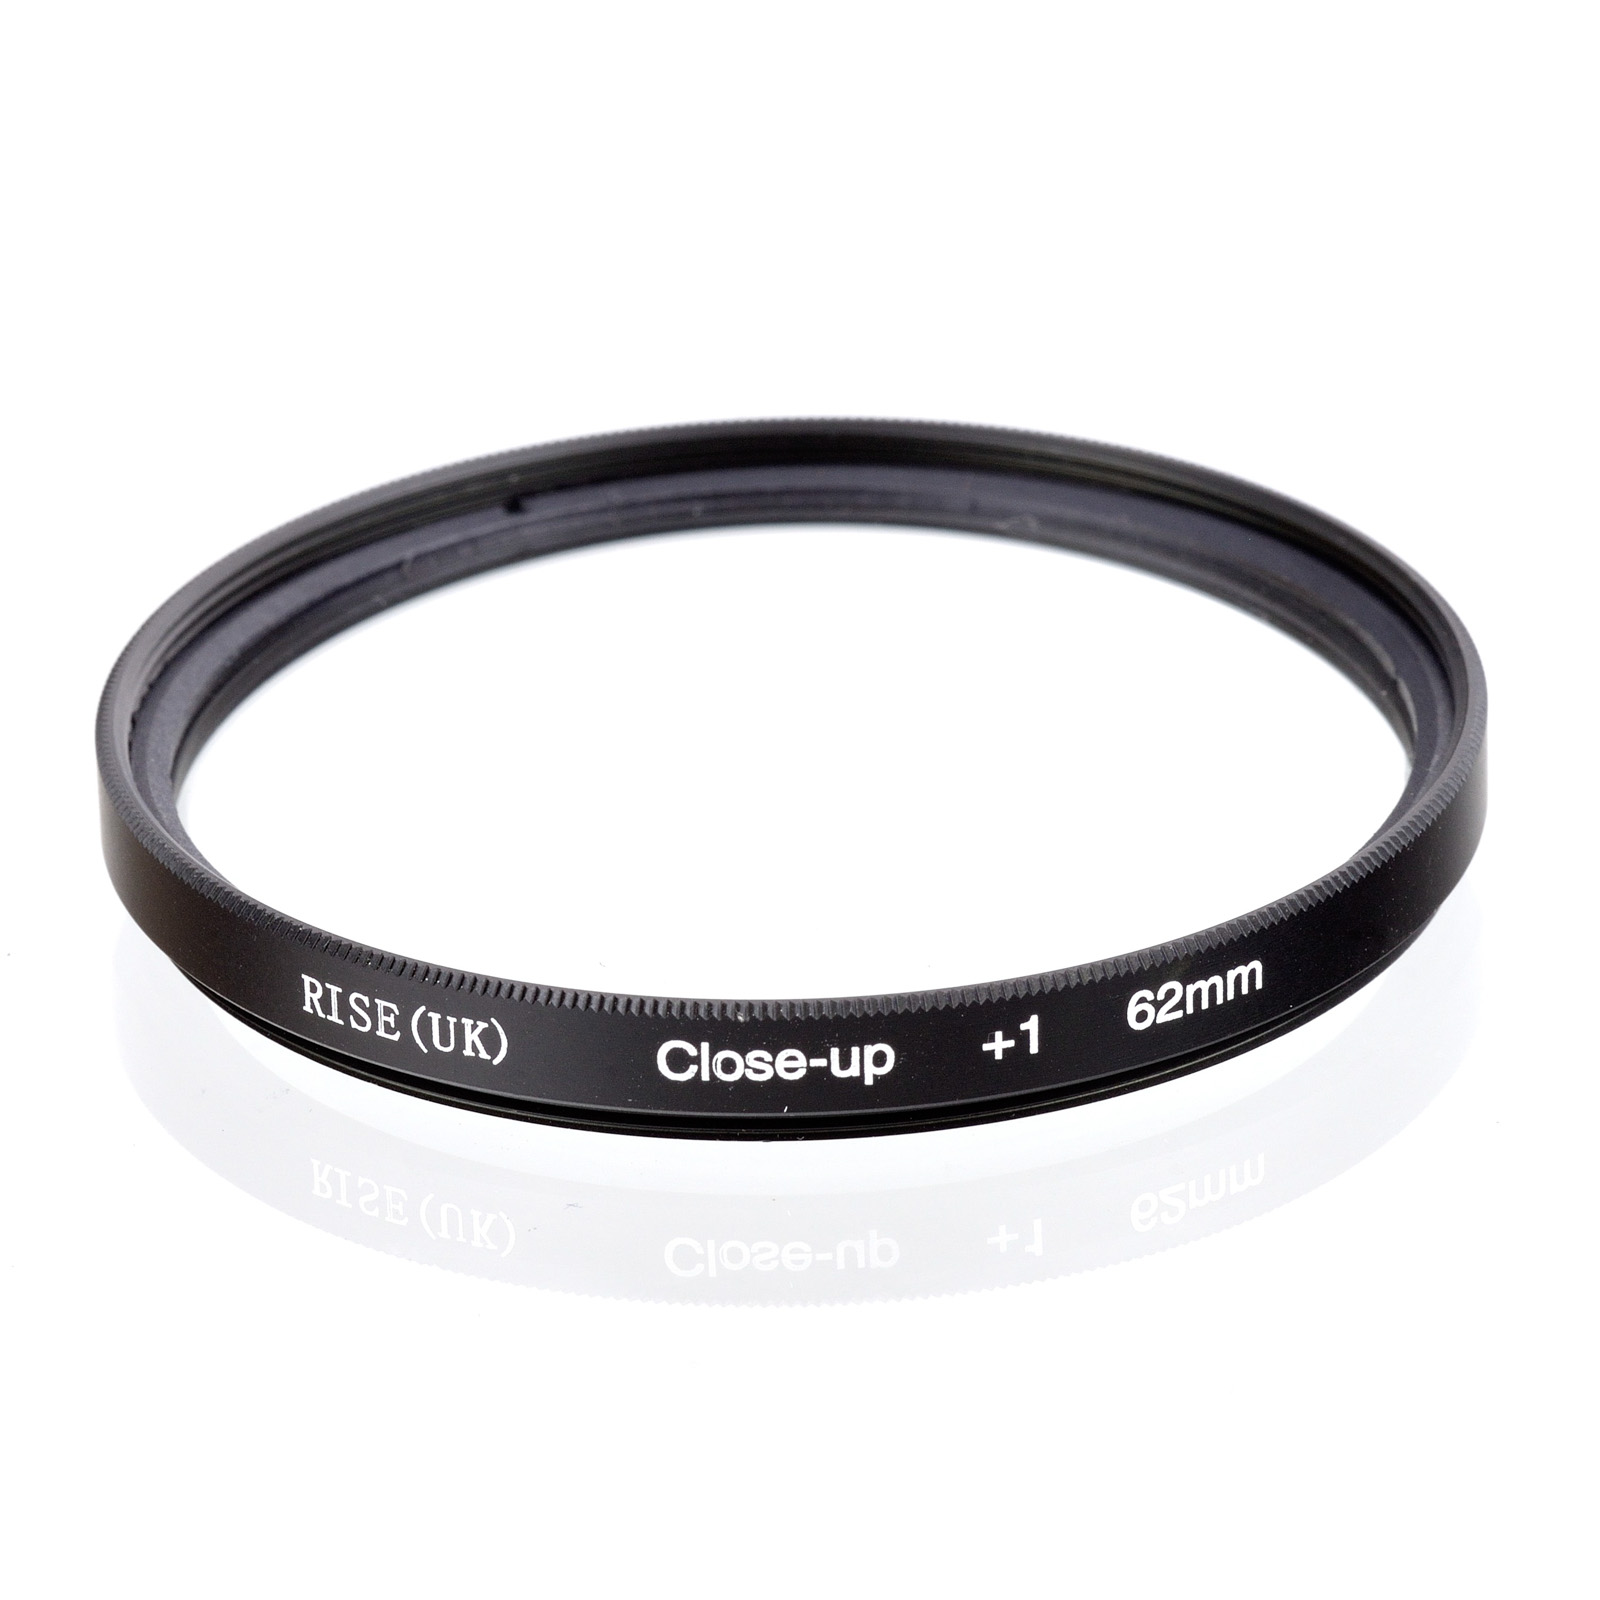 NAIK UK 62mm Makro Close Up 1 Lens Filter untuk Nikon Canon SLR Kamera DSLR gratis Pengiriman